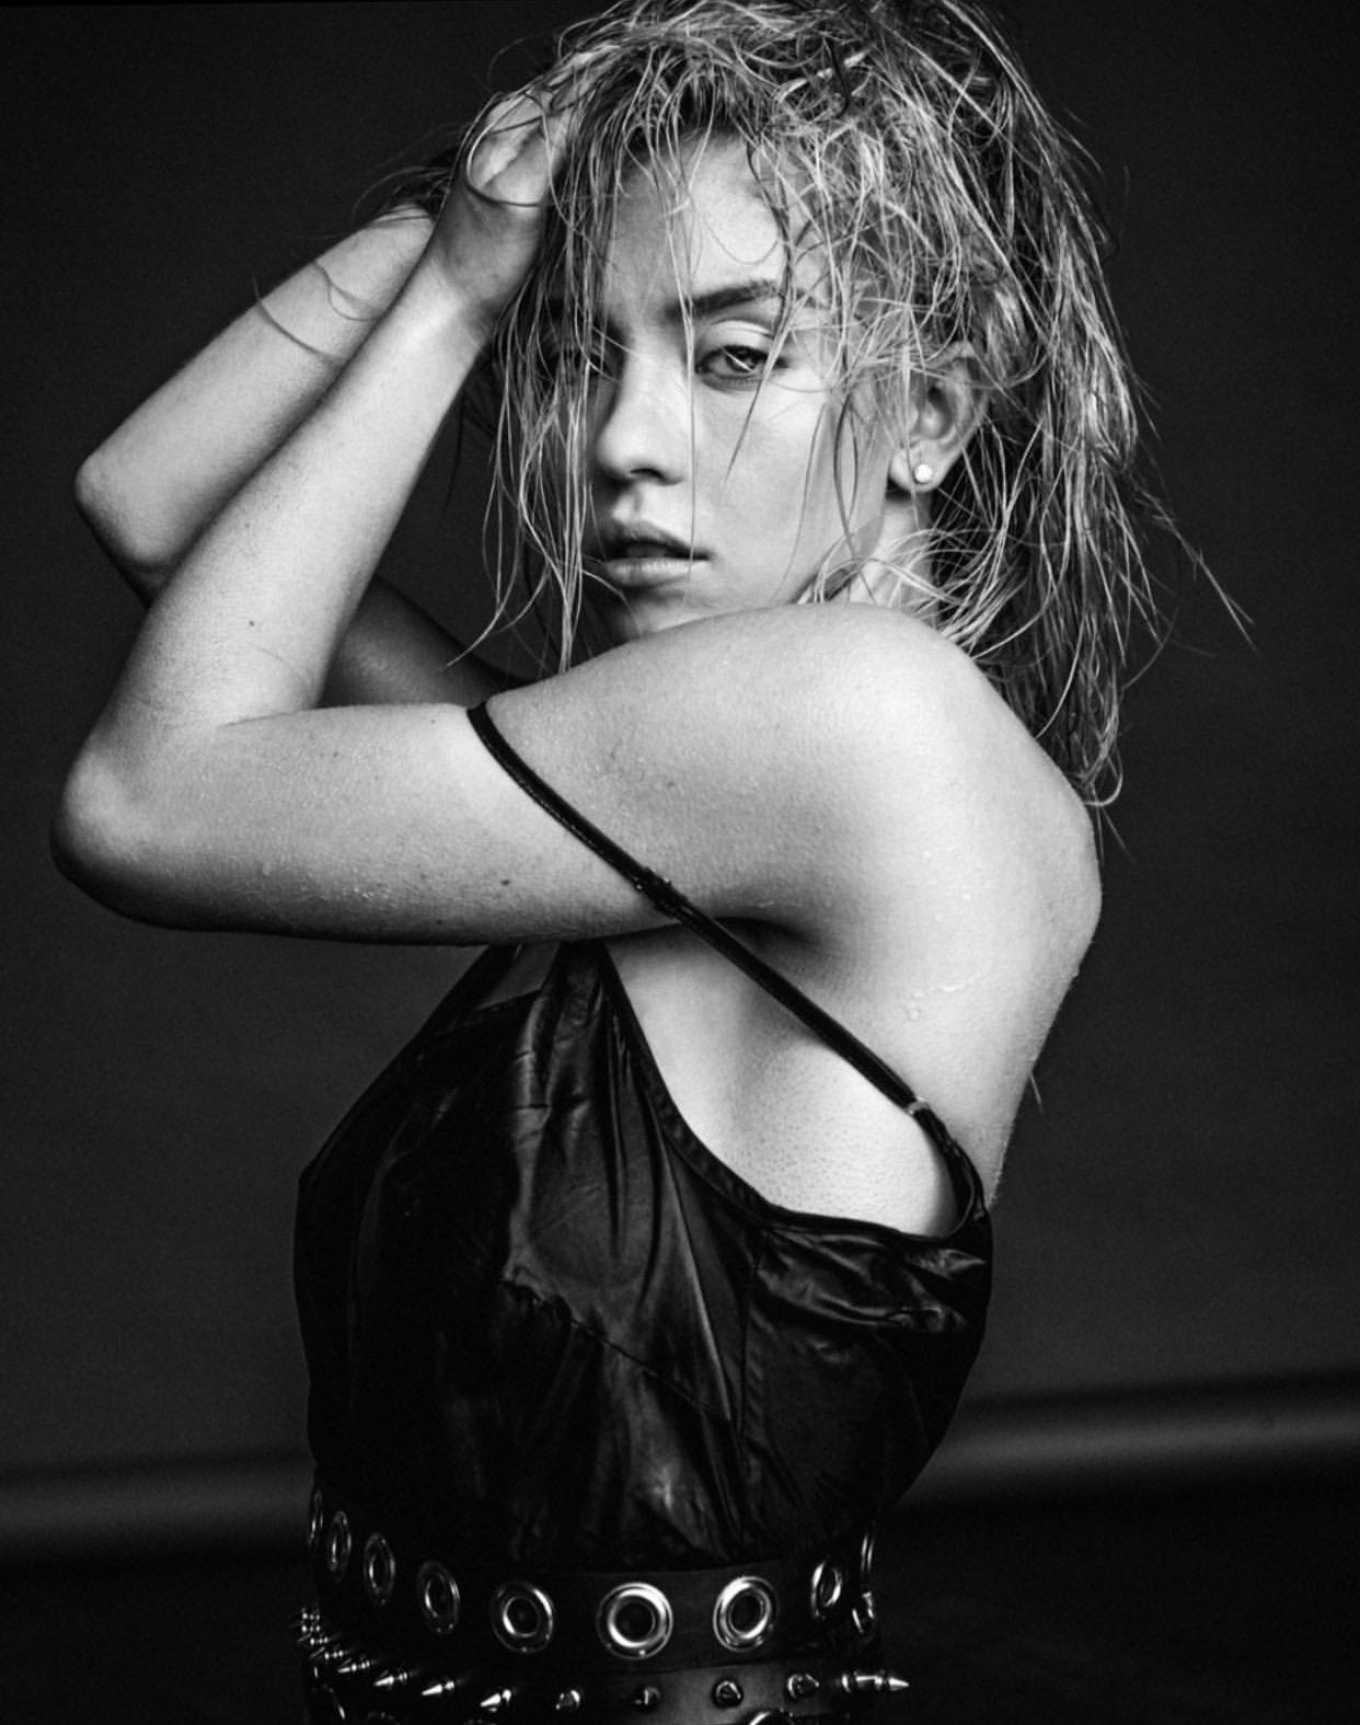 Sydney Sweeney by Damon Baker Photoshoot (January 2020)